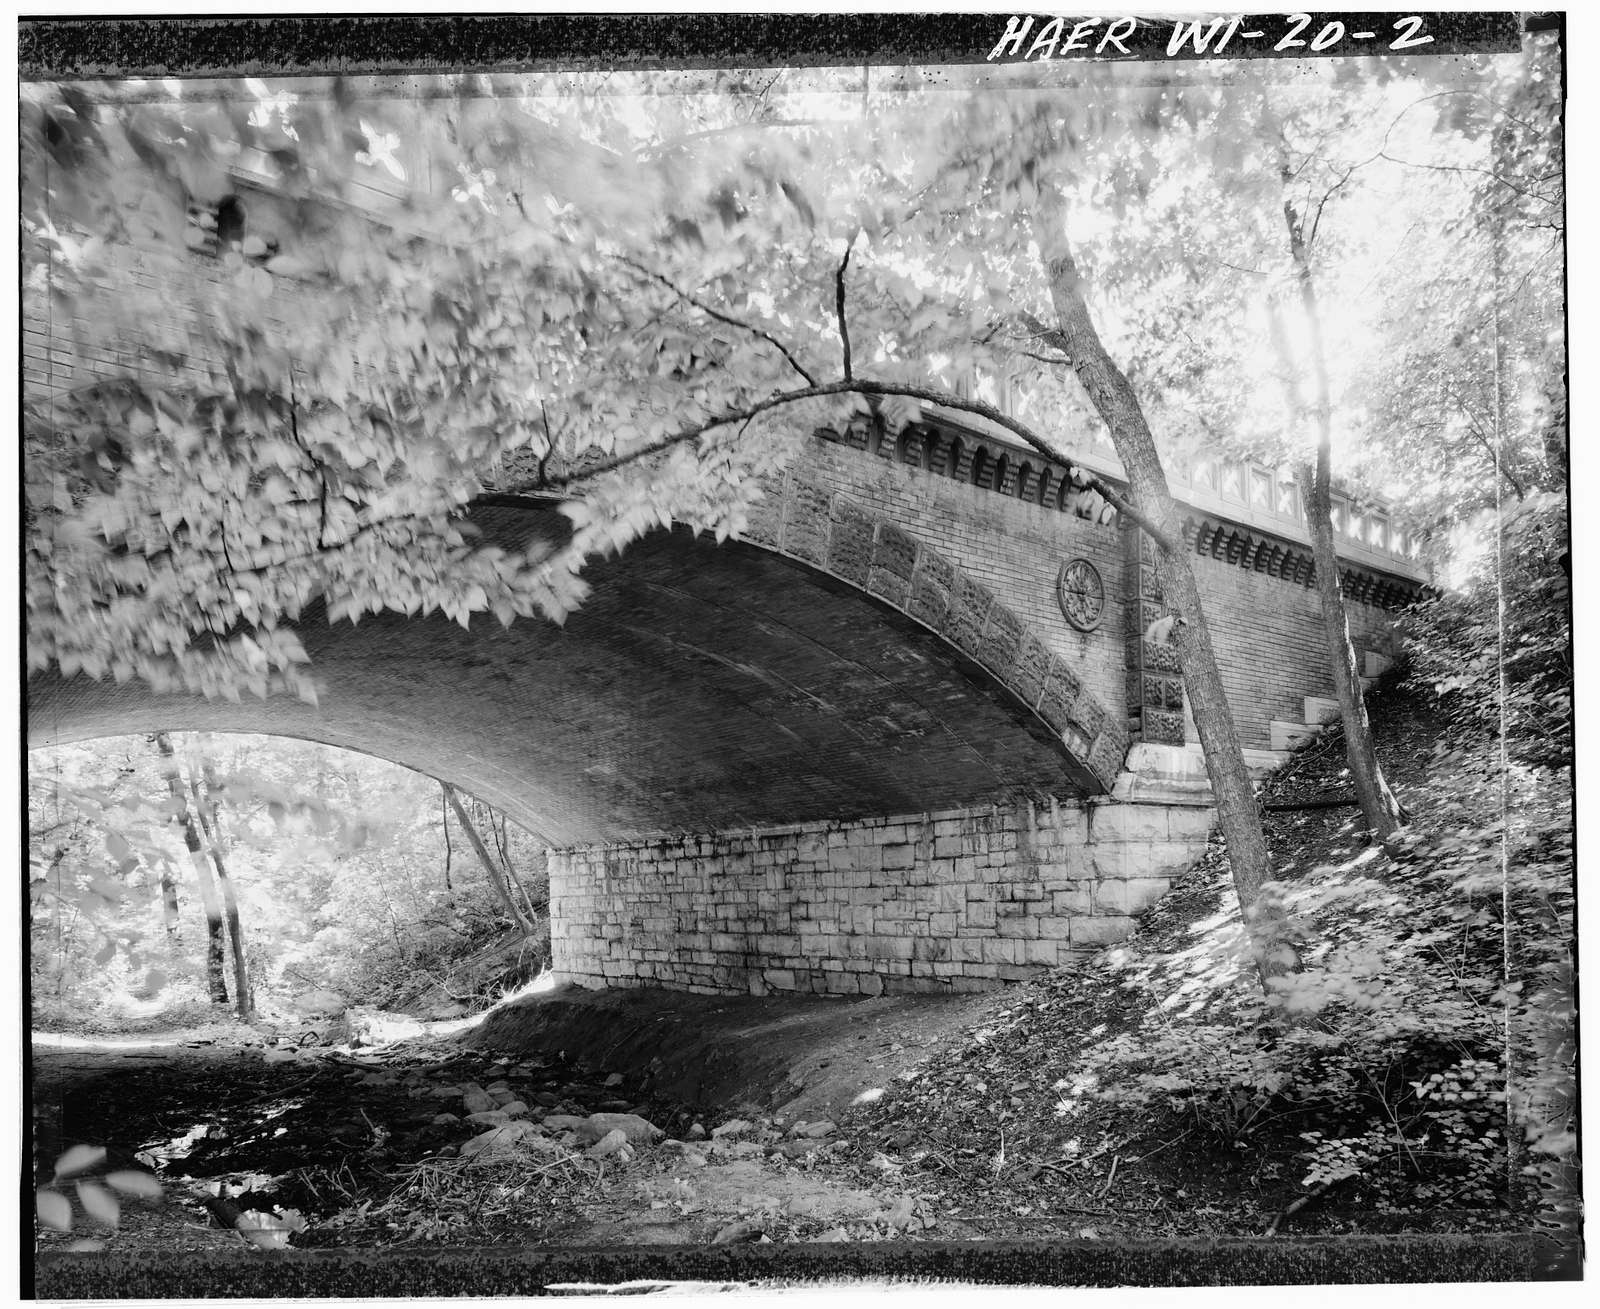 Lake Park Brick Arch Bridge, Lake Park Drive (North entrance to Lake Park), Milwaukee, Milwaukee County, WI